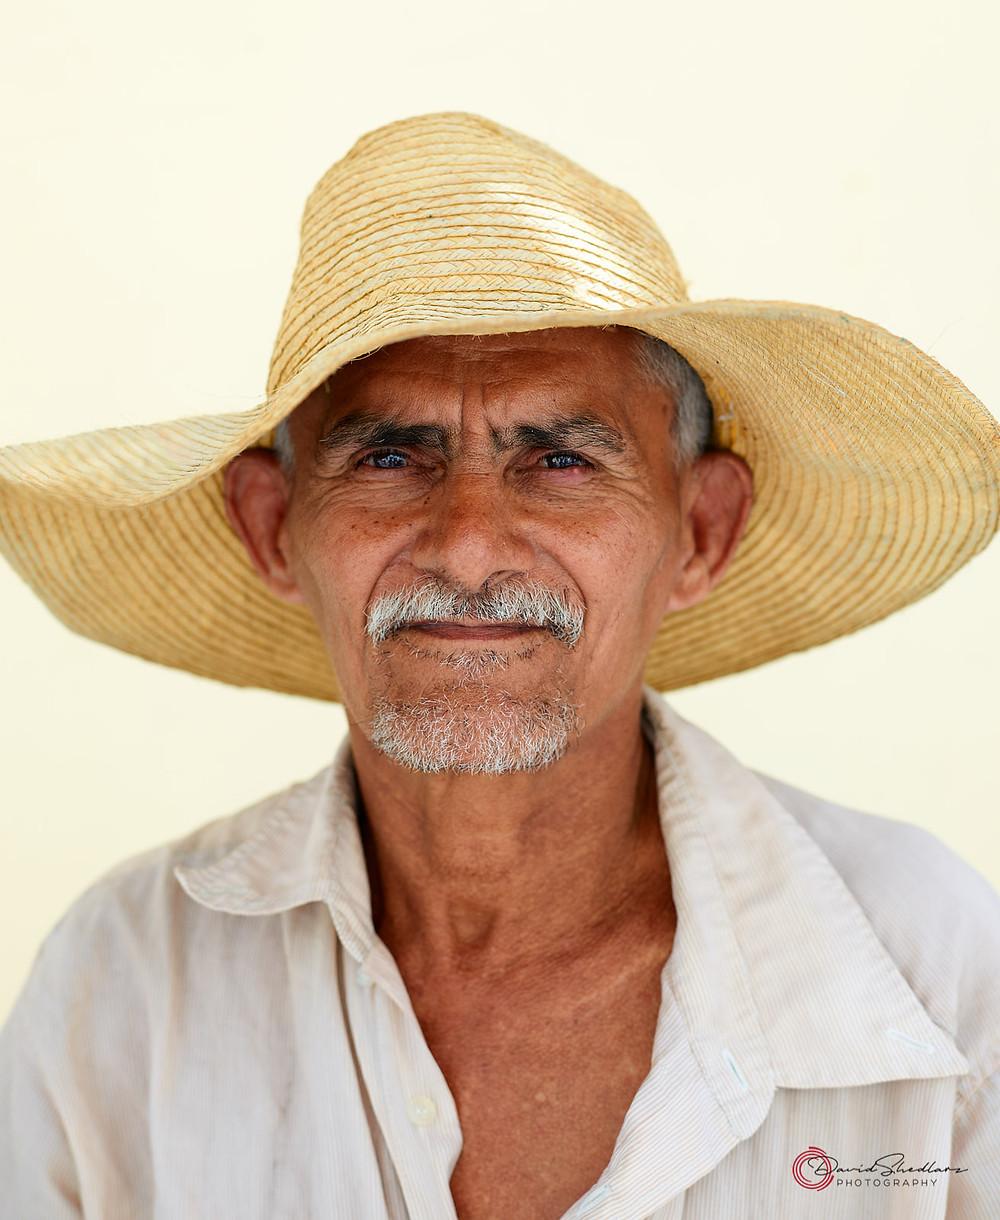 Cuban Gentleman - Cuba | David Shedlarz Photography